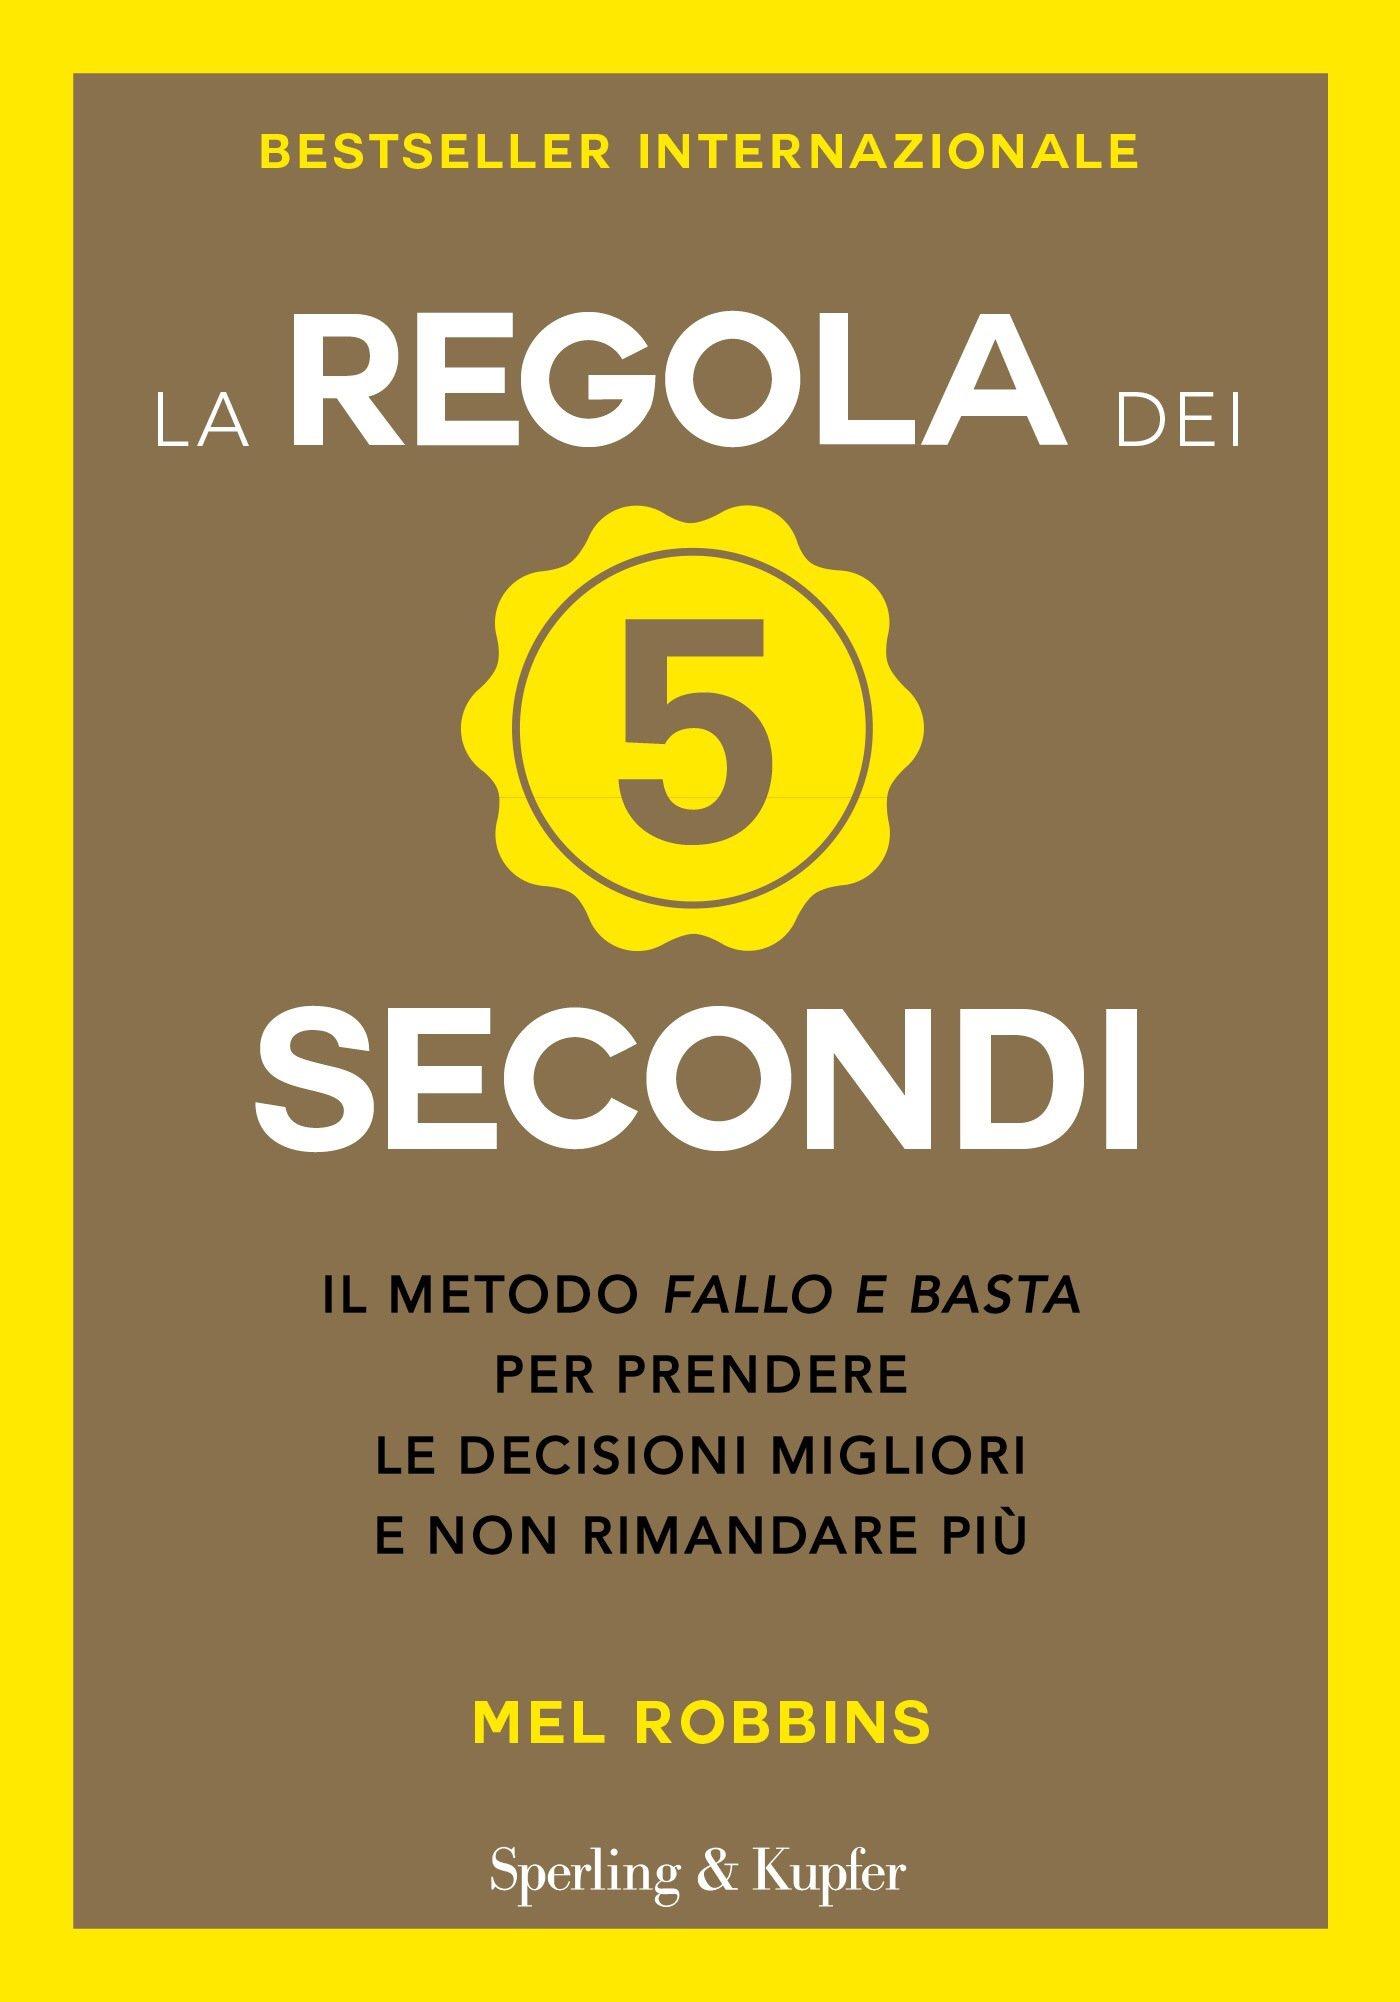 La regola dei 5 secondi – Mel Robbins – Sperling & Kupfer